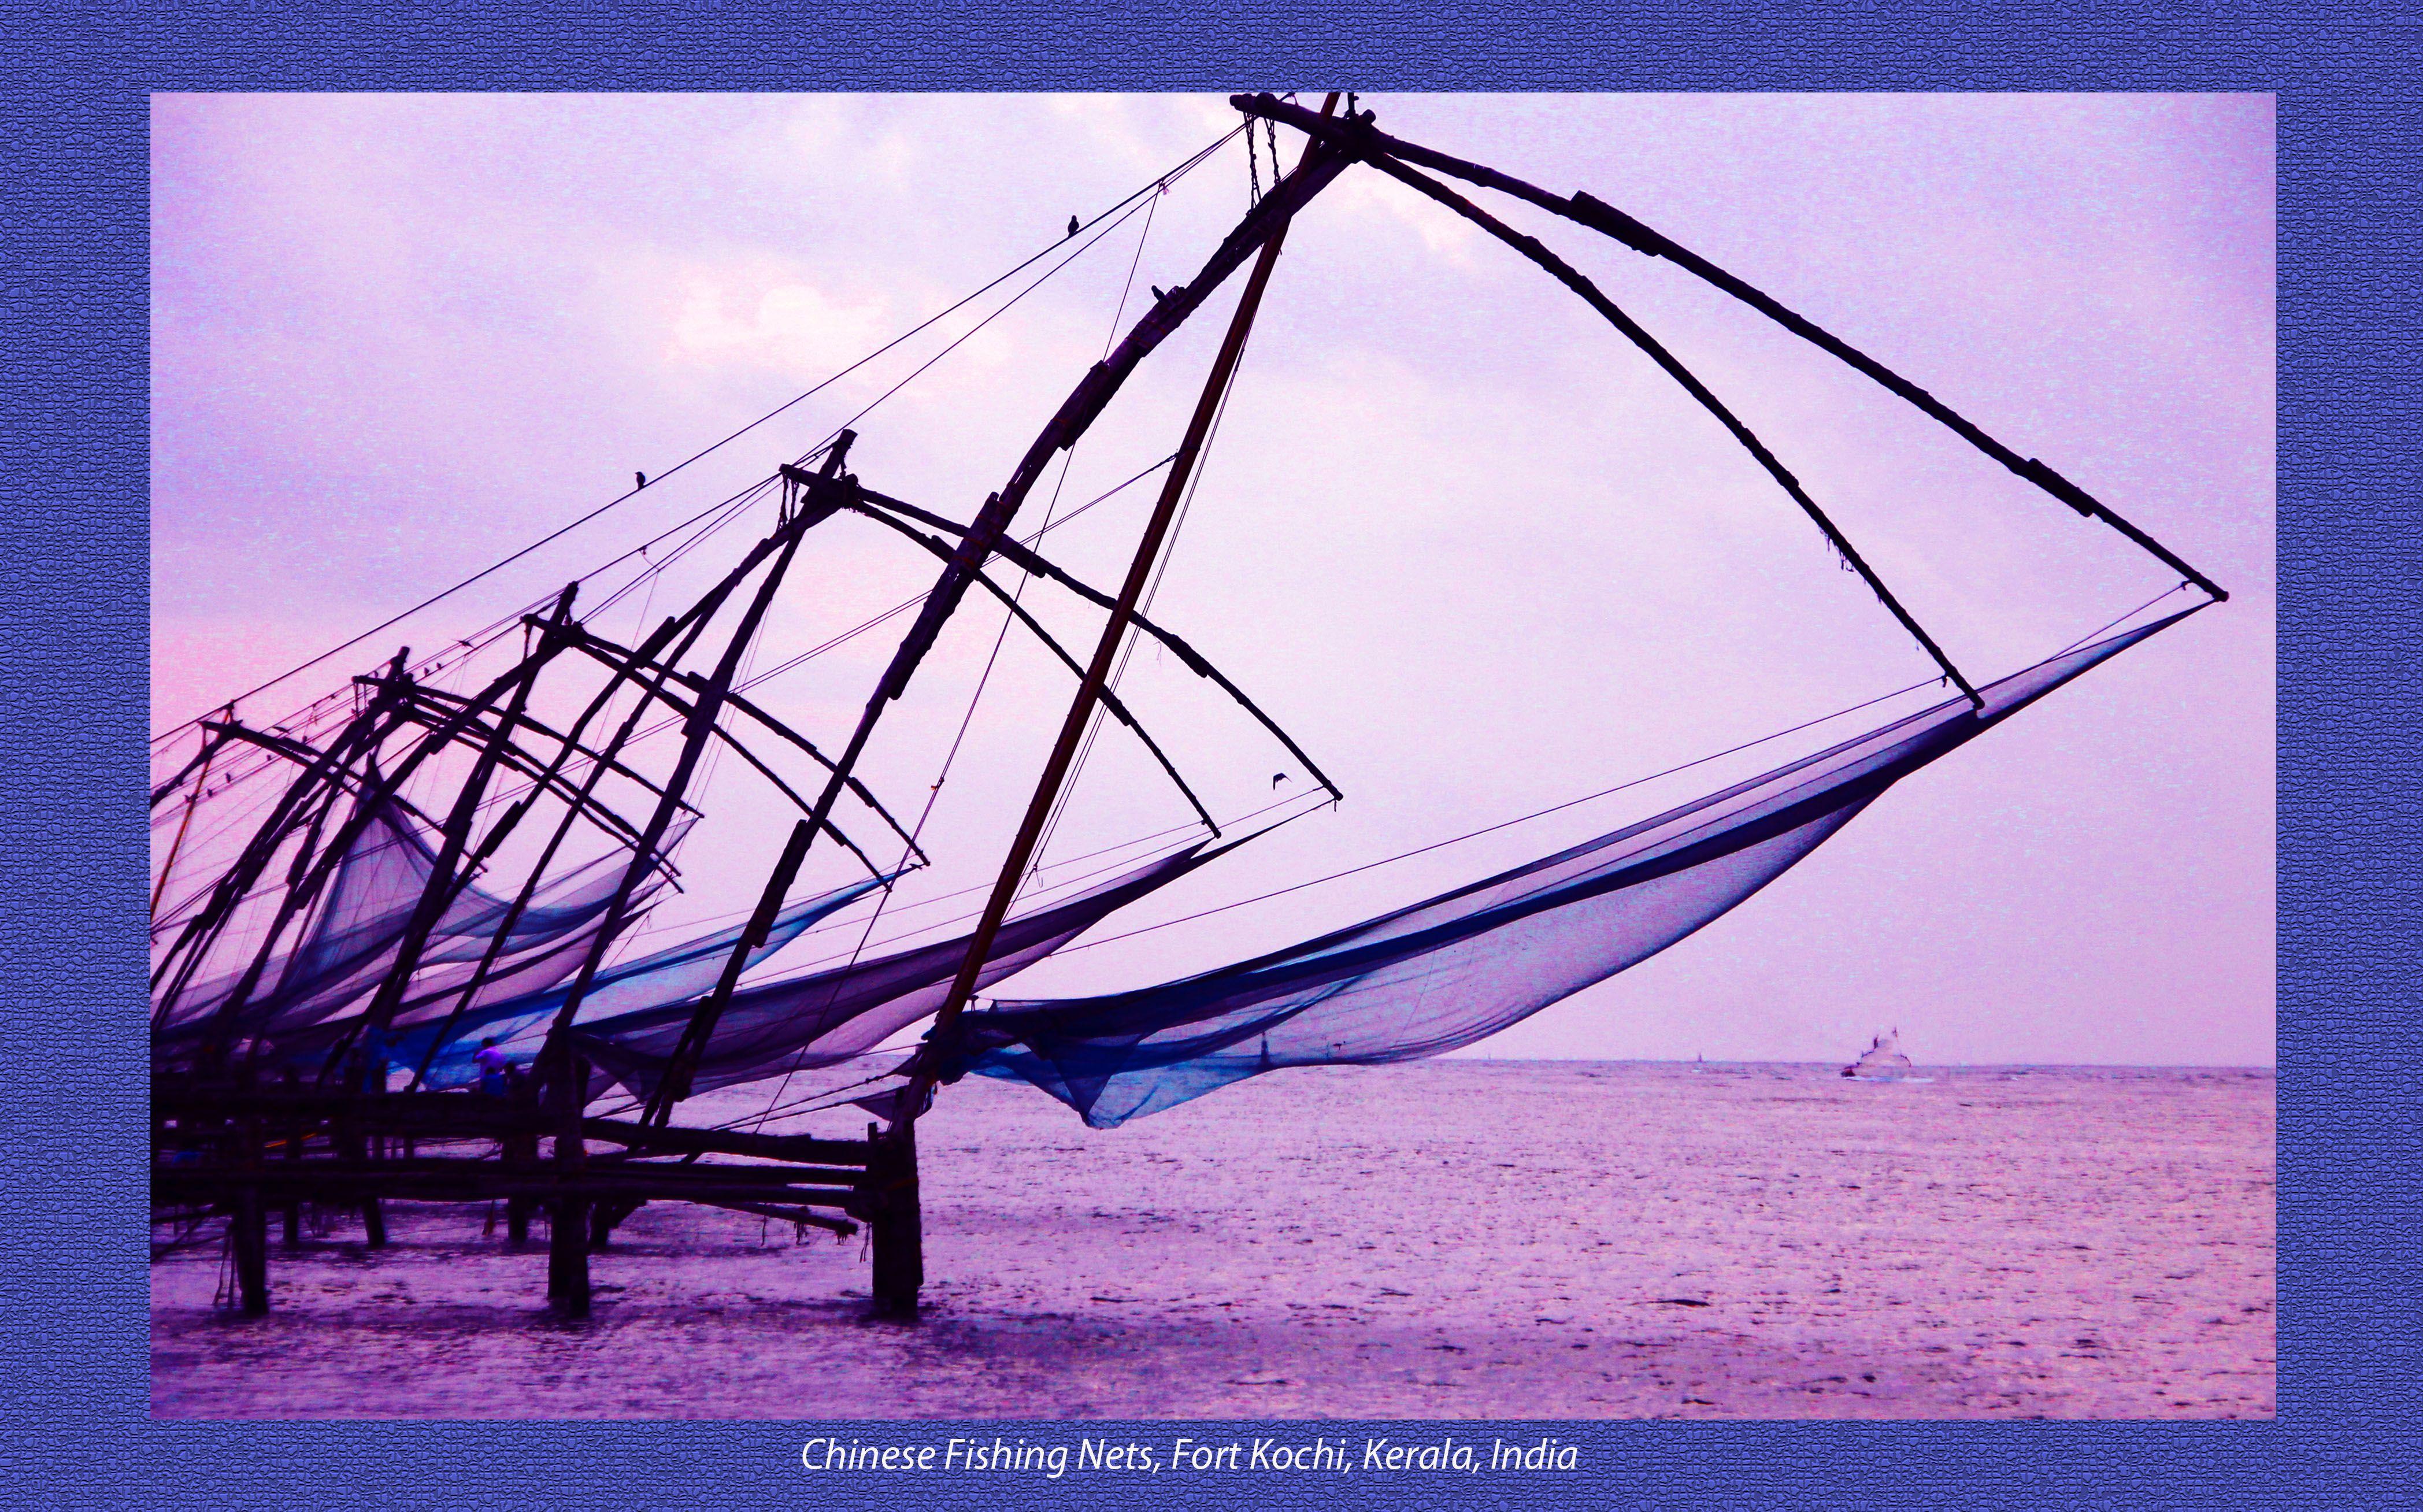 Chinese Fishing Nets Fort Kochi, Kerela, India Kochi